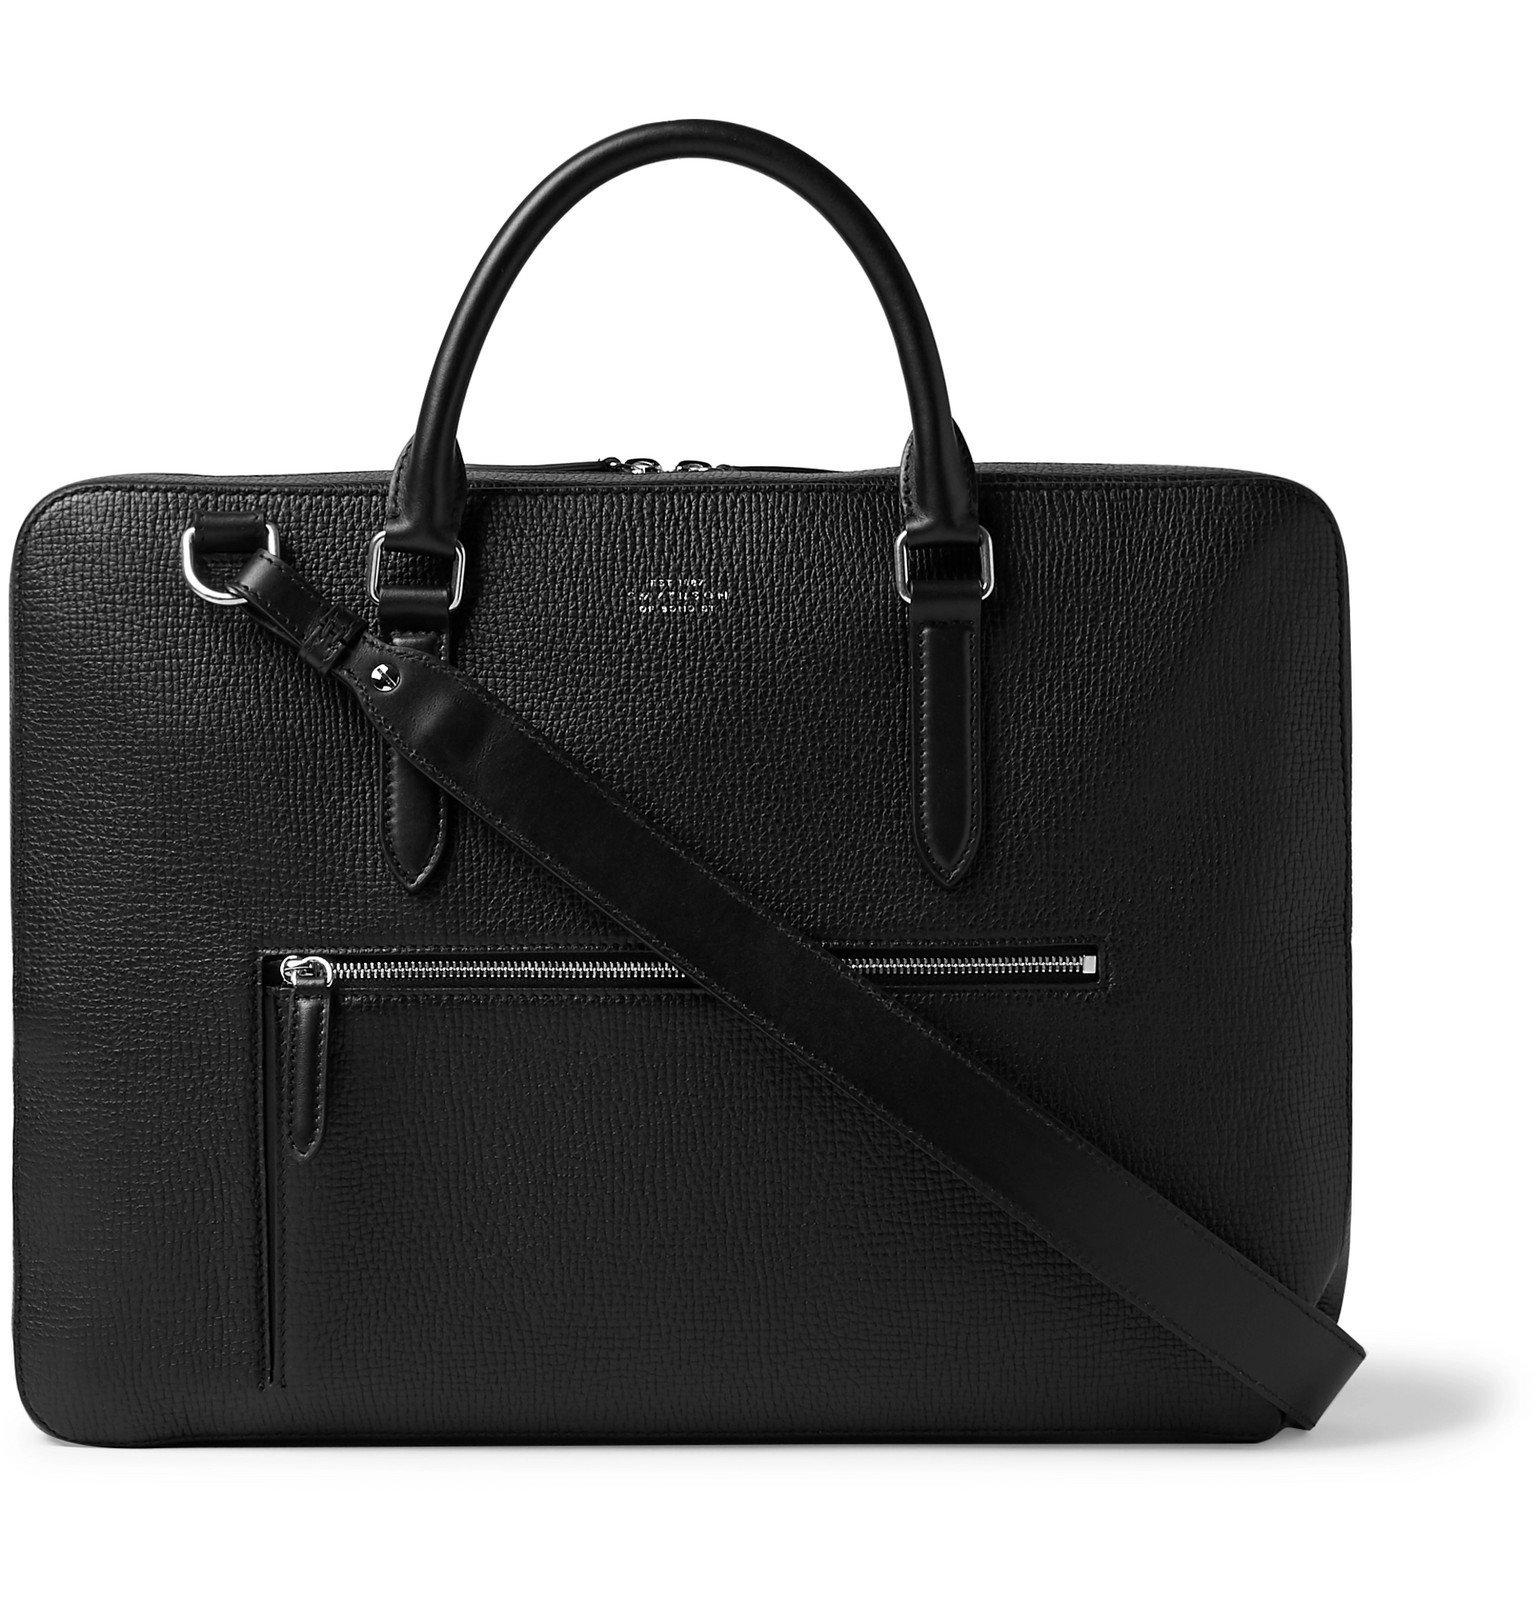 Smythson - Ludlow Full-Grain Leather Briefcase - Black